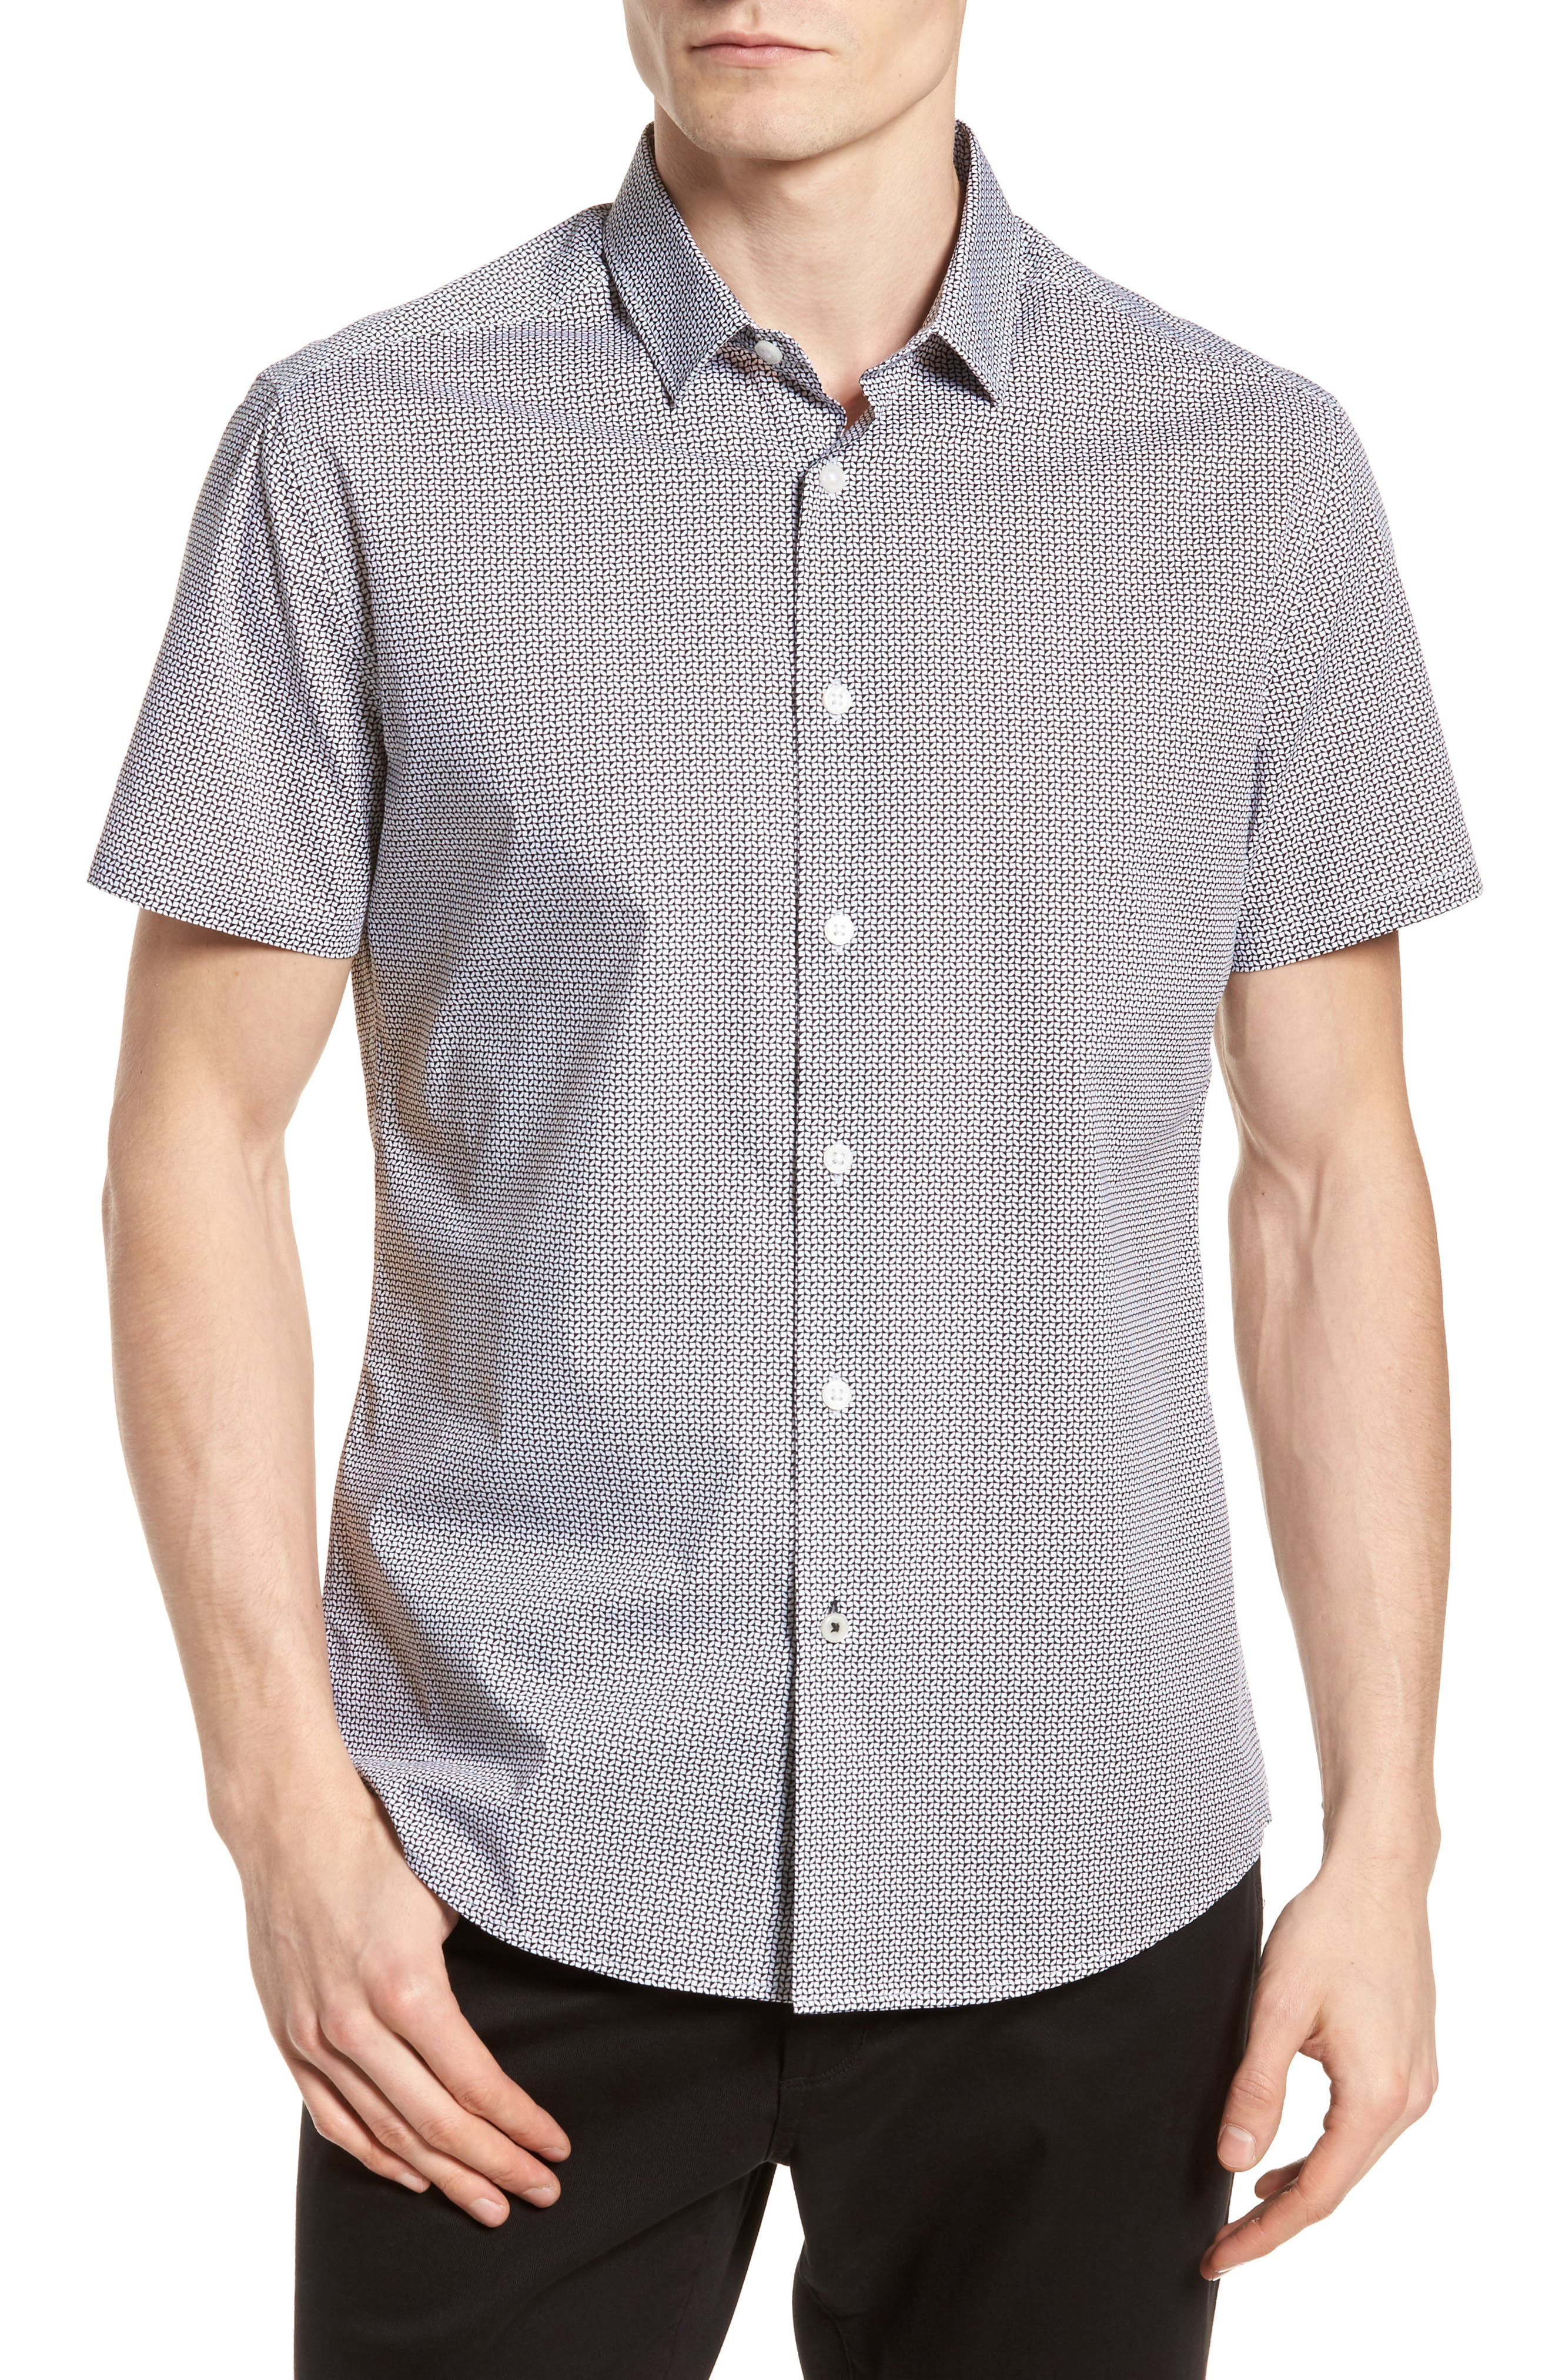 Alternate Image 1 Selected - Vince Camuto Slim Fit Geo Print Sport Shirt